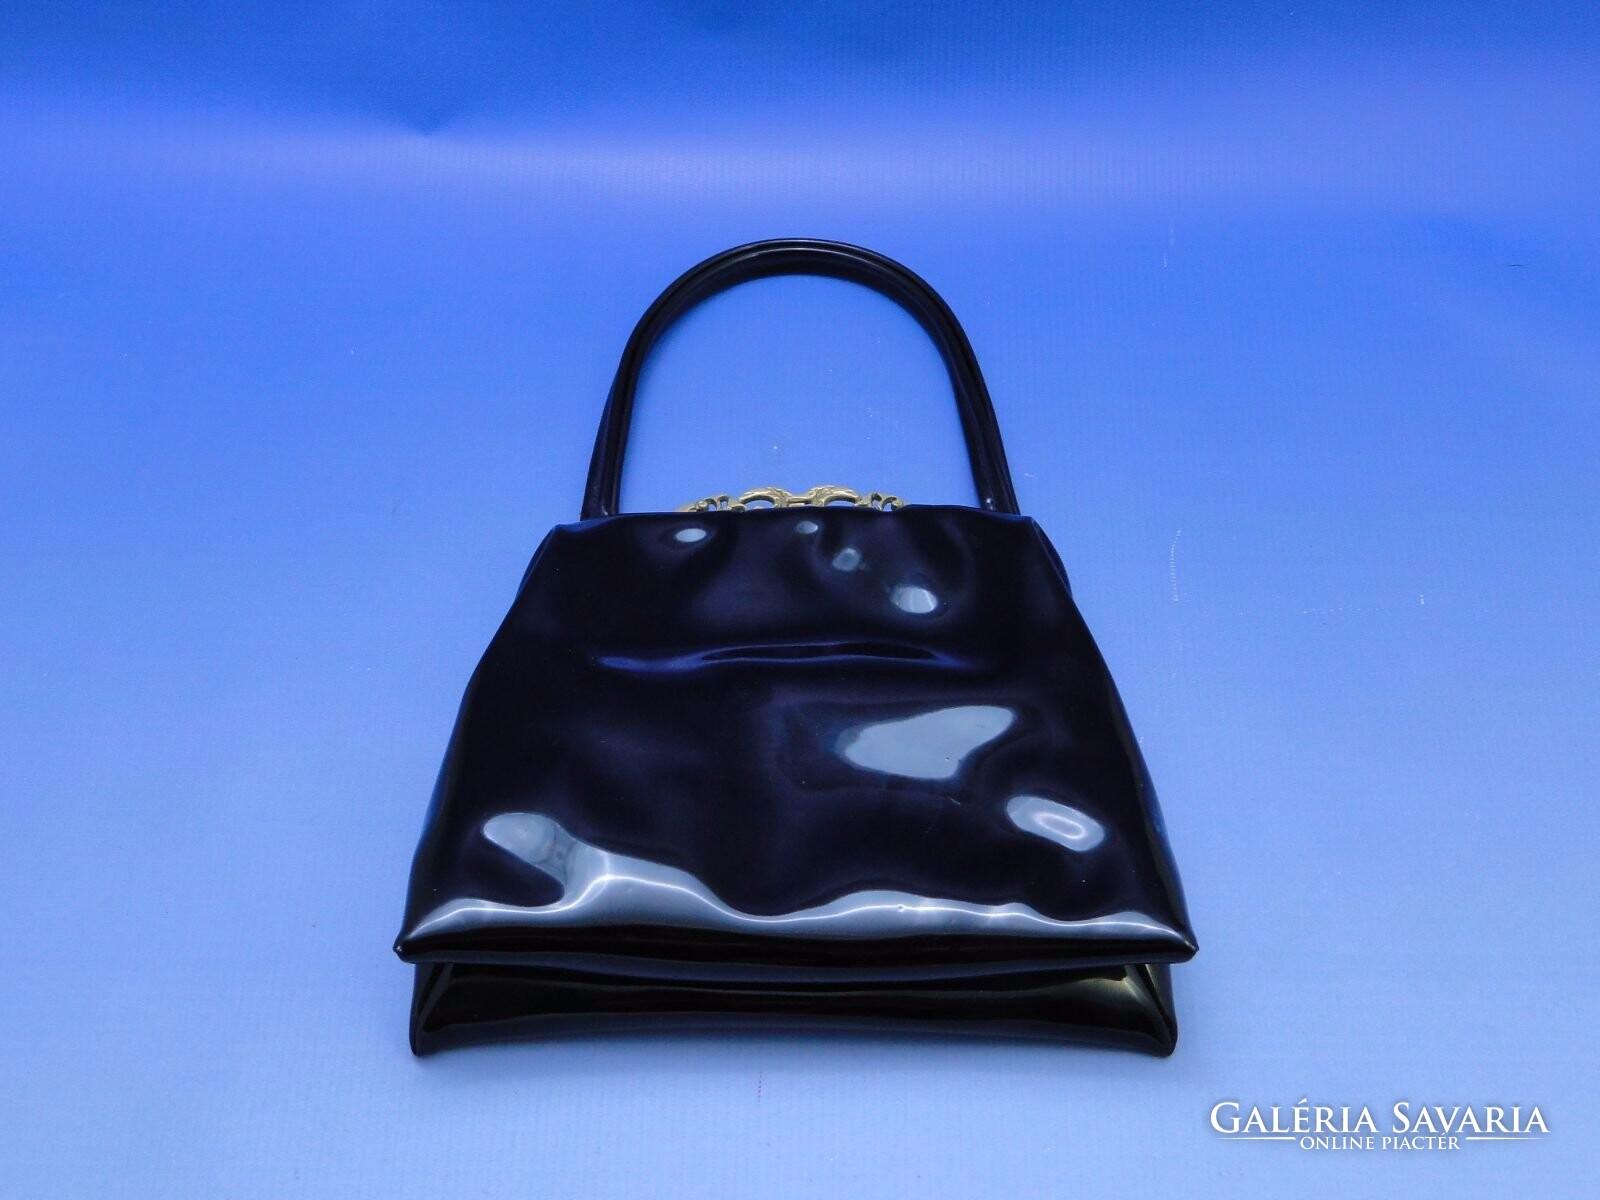 Velúrbőr női táska Wardrobe   Galeria Savaria online antique